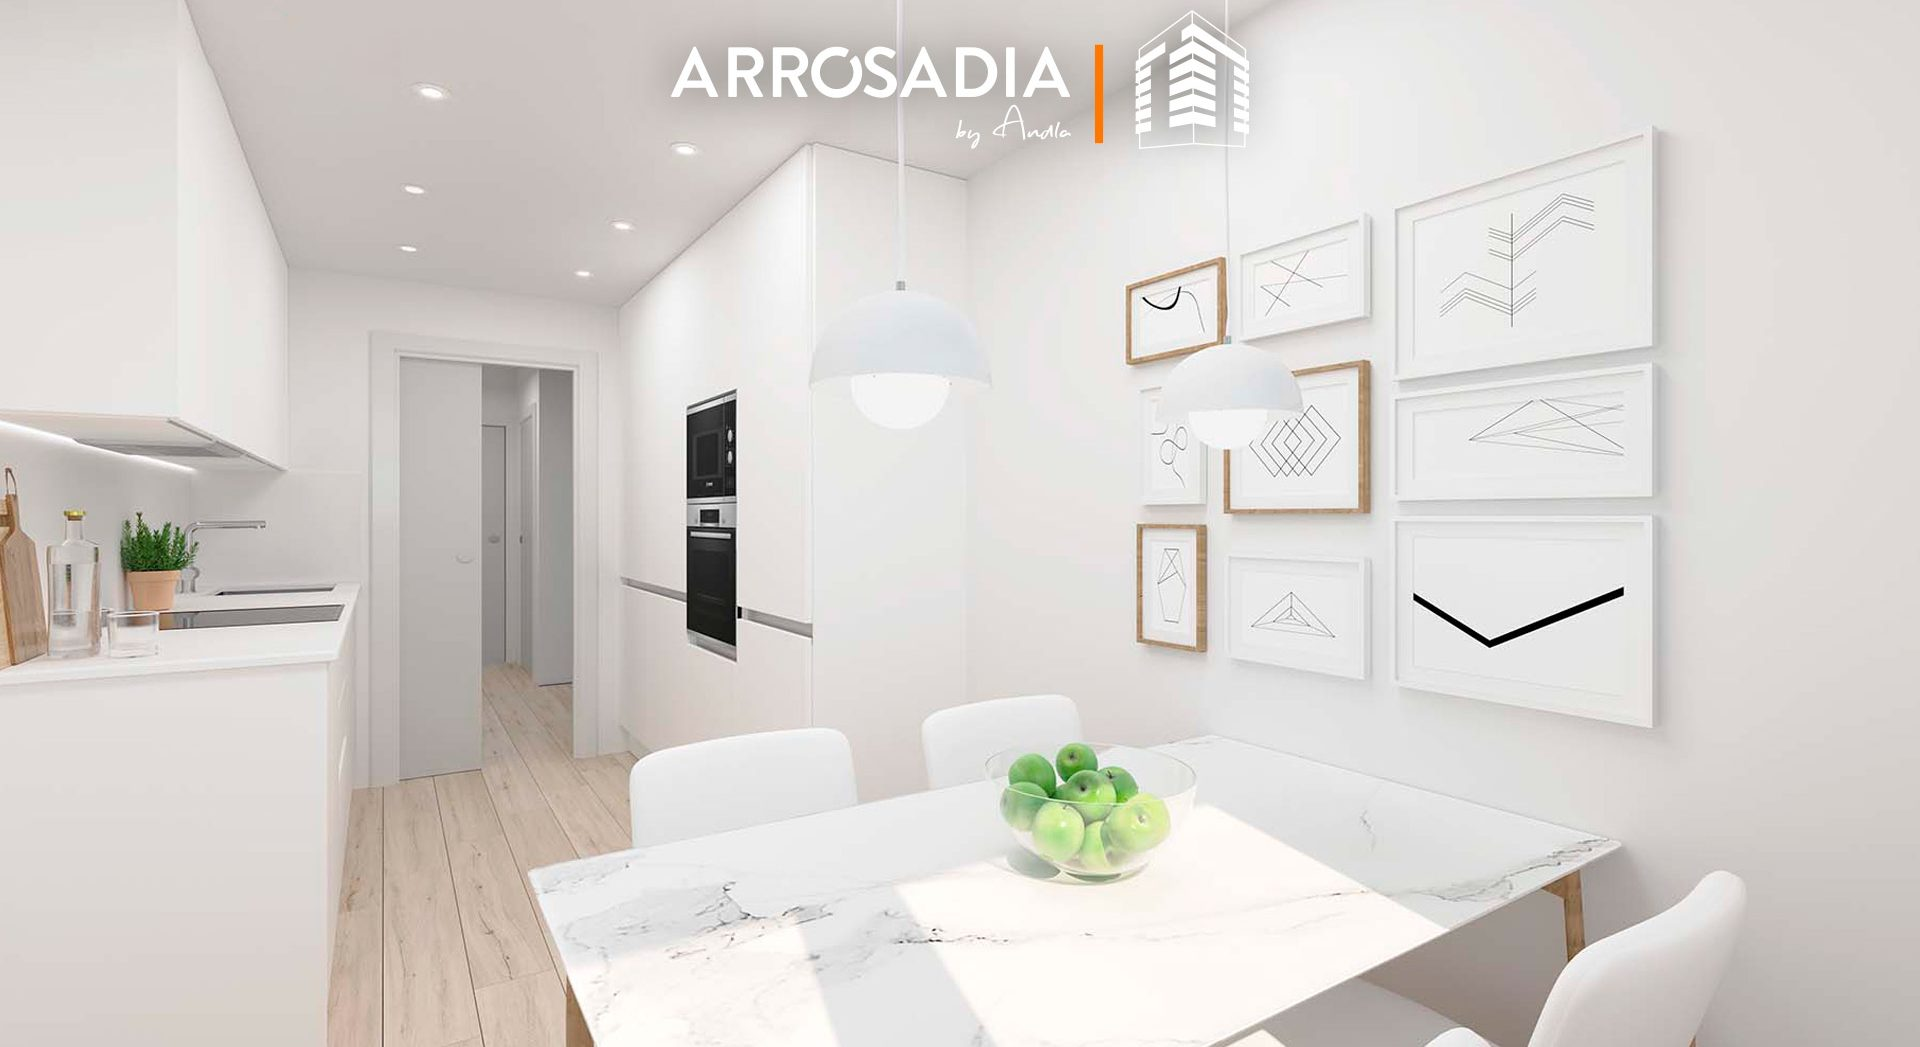 ANDIA_ARROSADIA_COCINA_2-slide-1920x1047